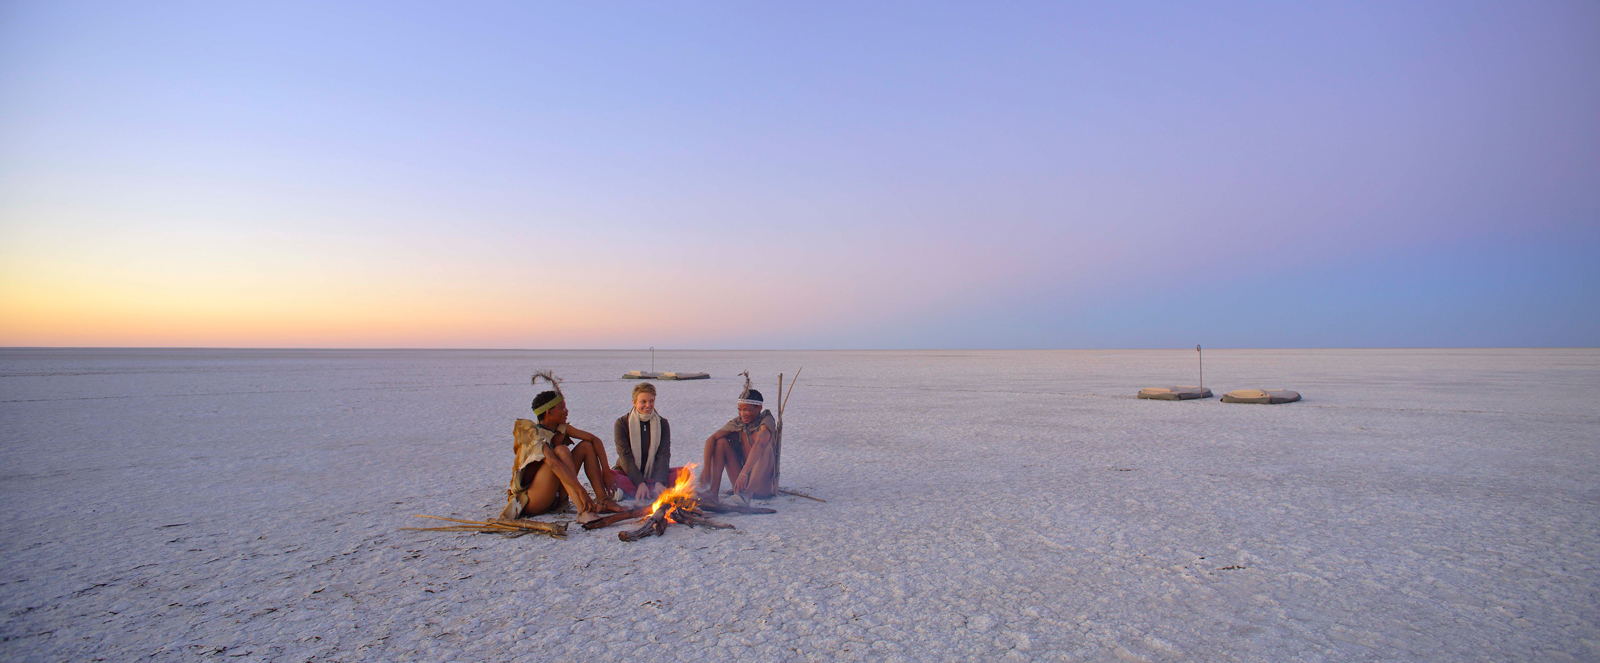 Khoisan and guest sitting in salt pan in Botswana